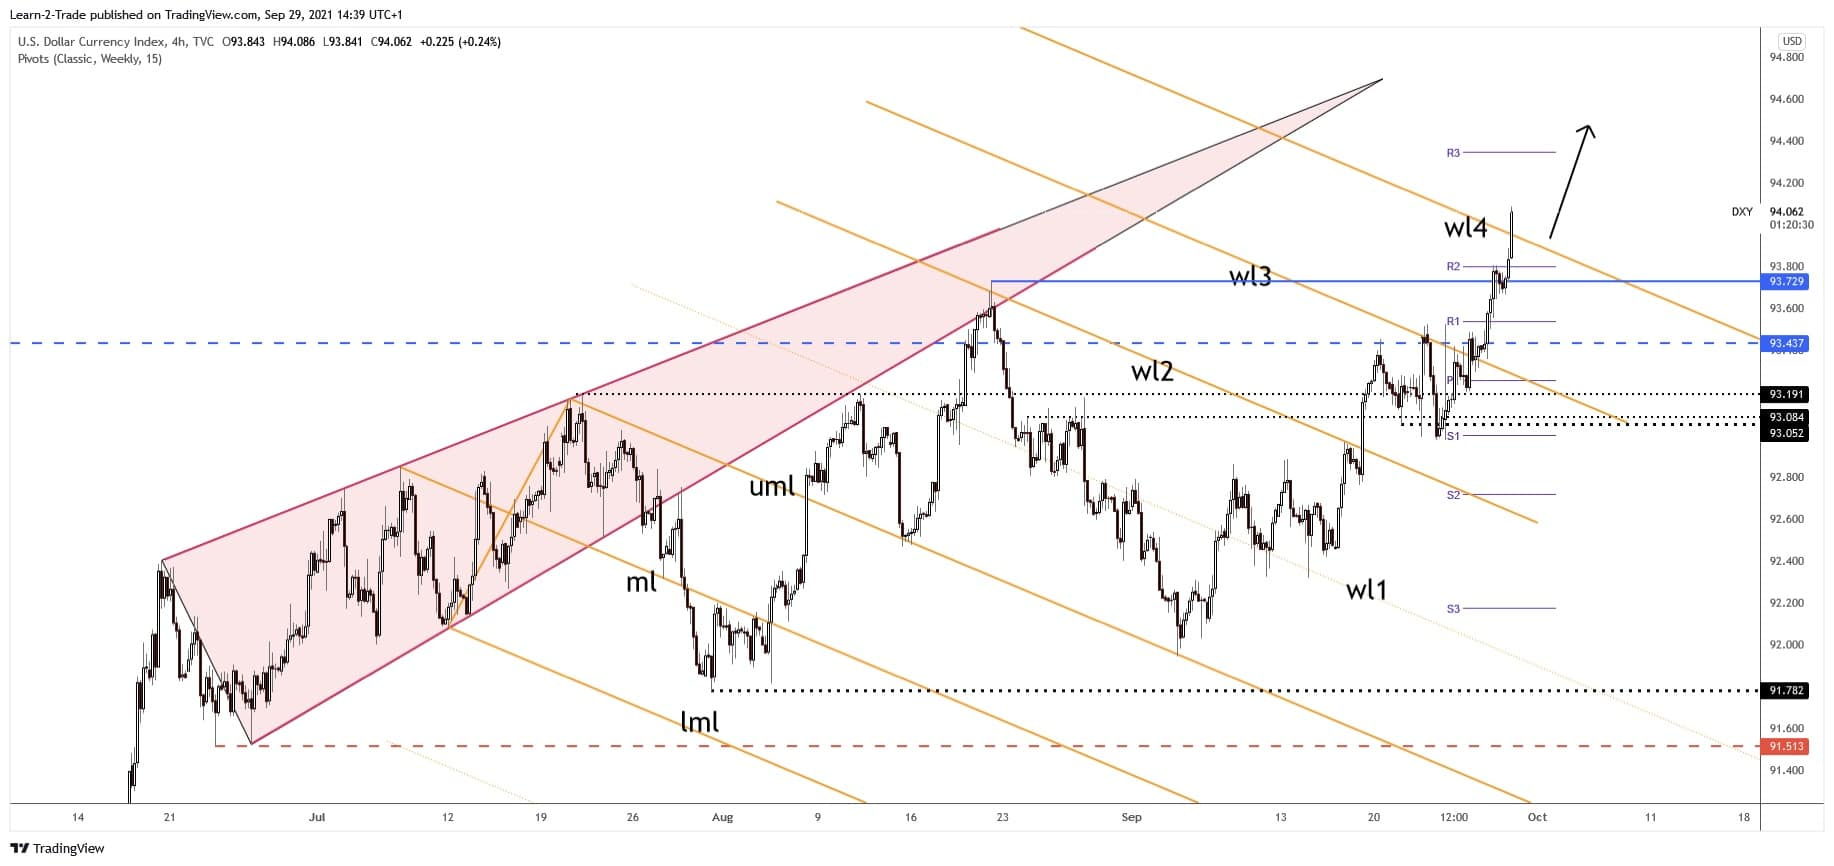 eur/usd forecast - dxy 29 september 2021